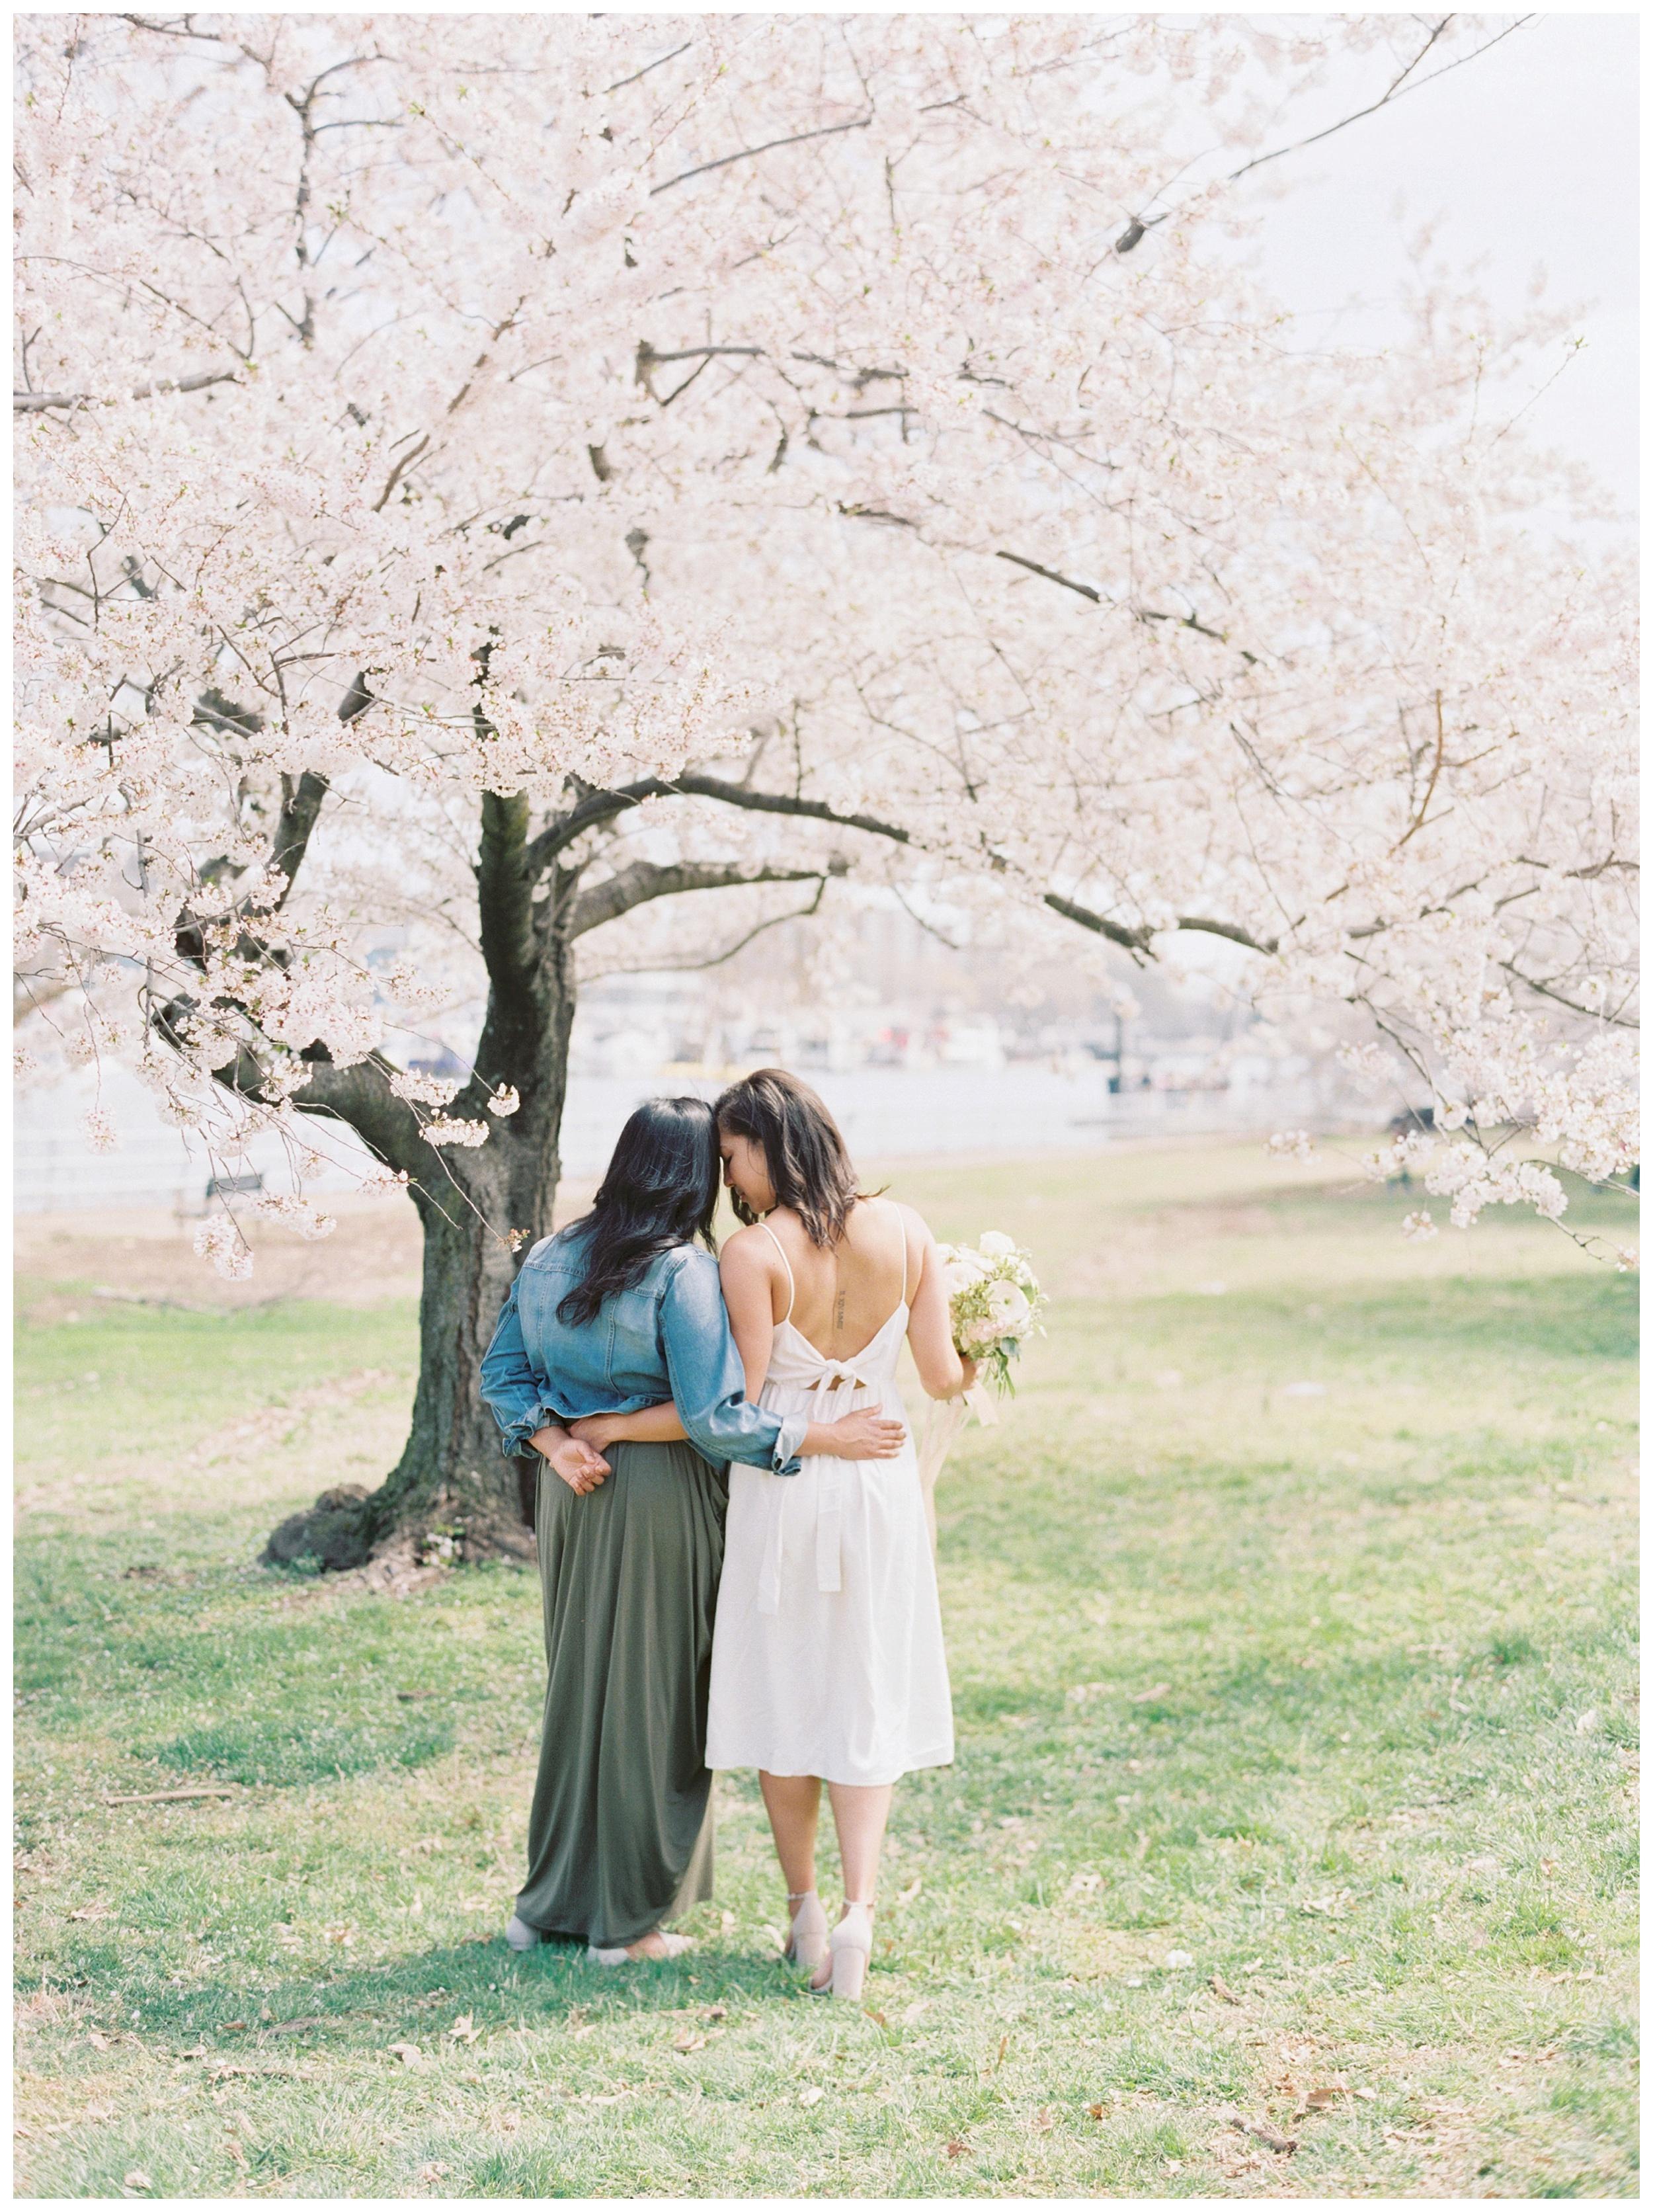 Same Sex DC Engagement | District of Columbia Cherry Blossom Engagement Kir Tuben_0010.jpg